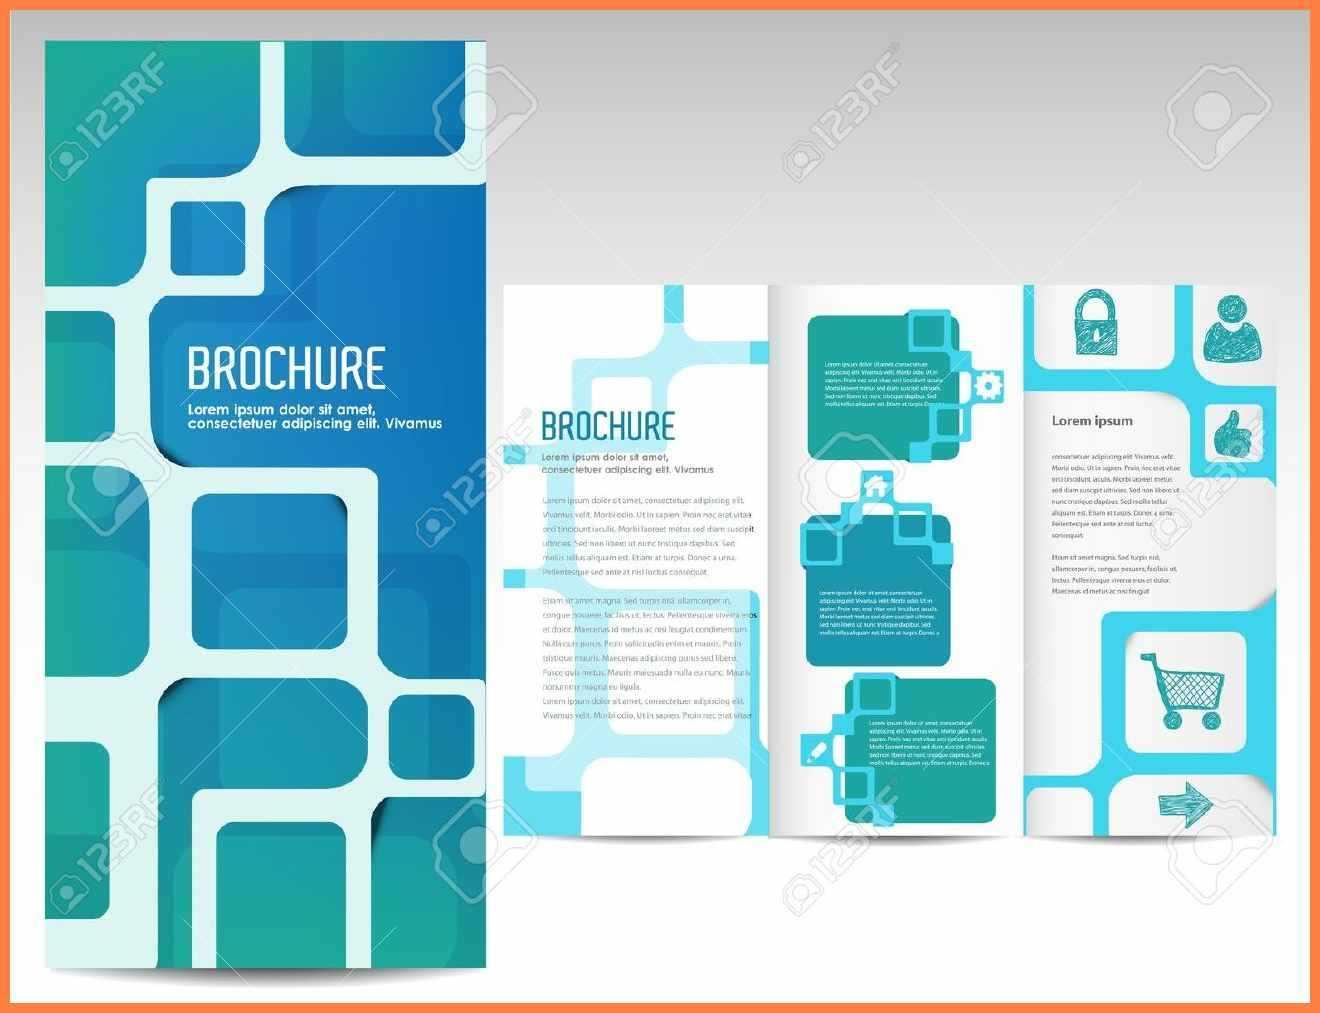 001 Free Microsoft Word Tri Fold Brochure Templates Template With Free Tri Fold Brochure Templates Microsoft Word